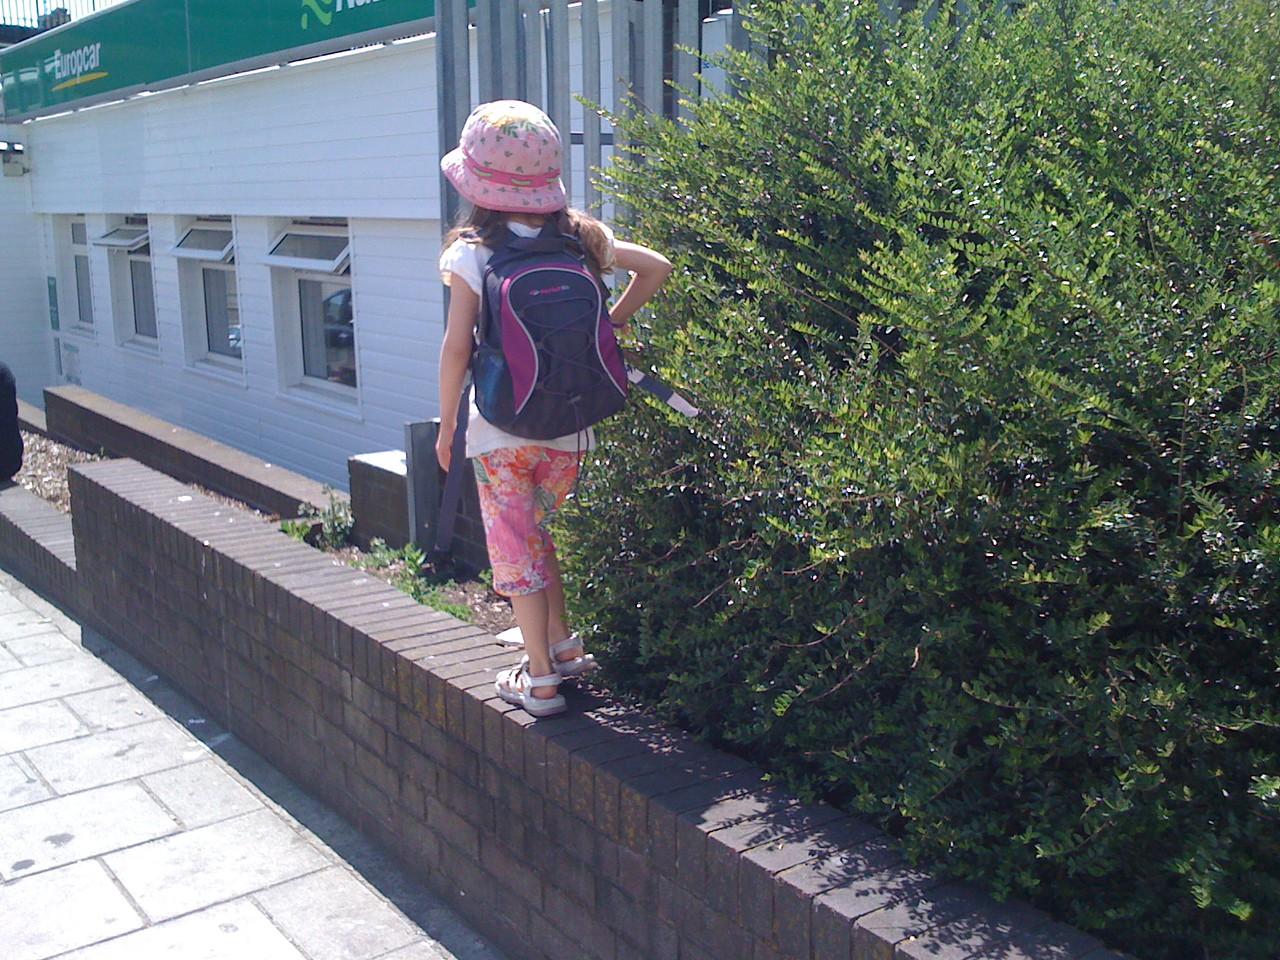 Walking along the ledges at Churchill Square